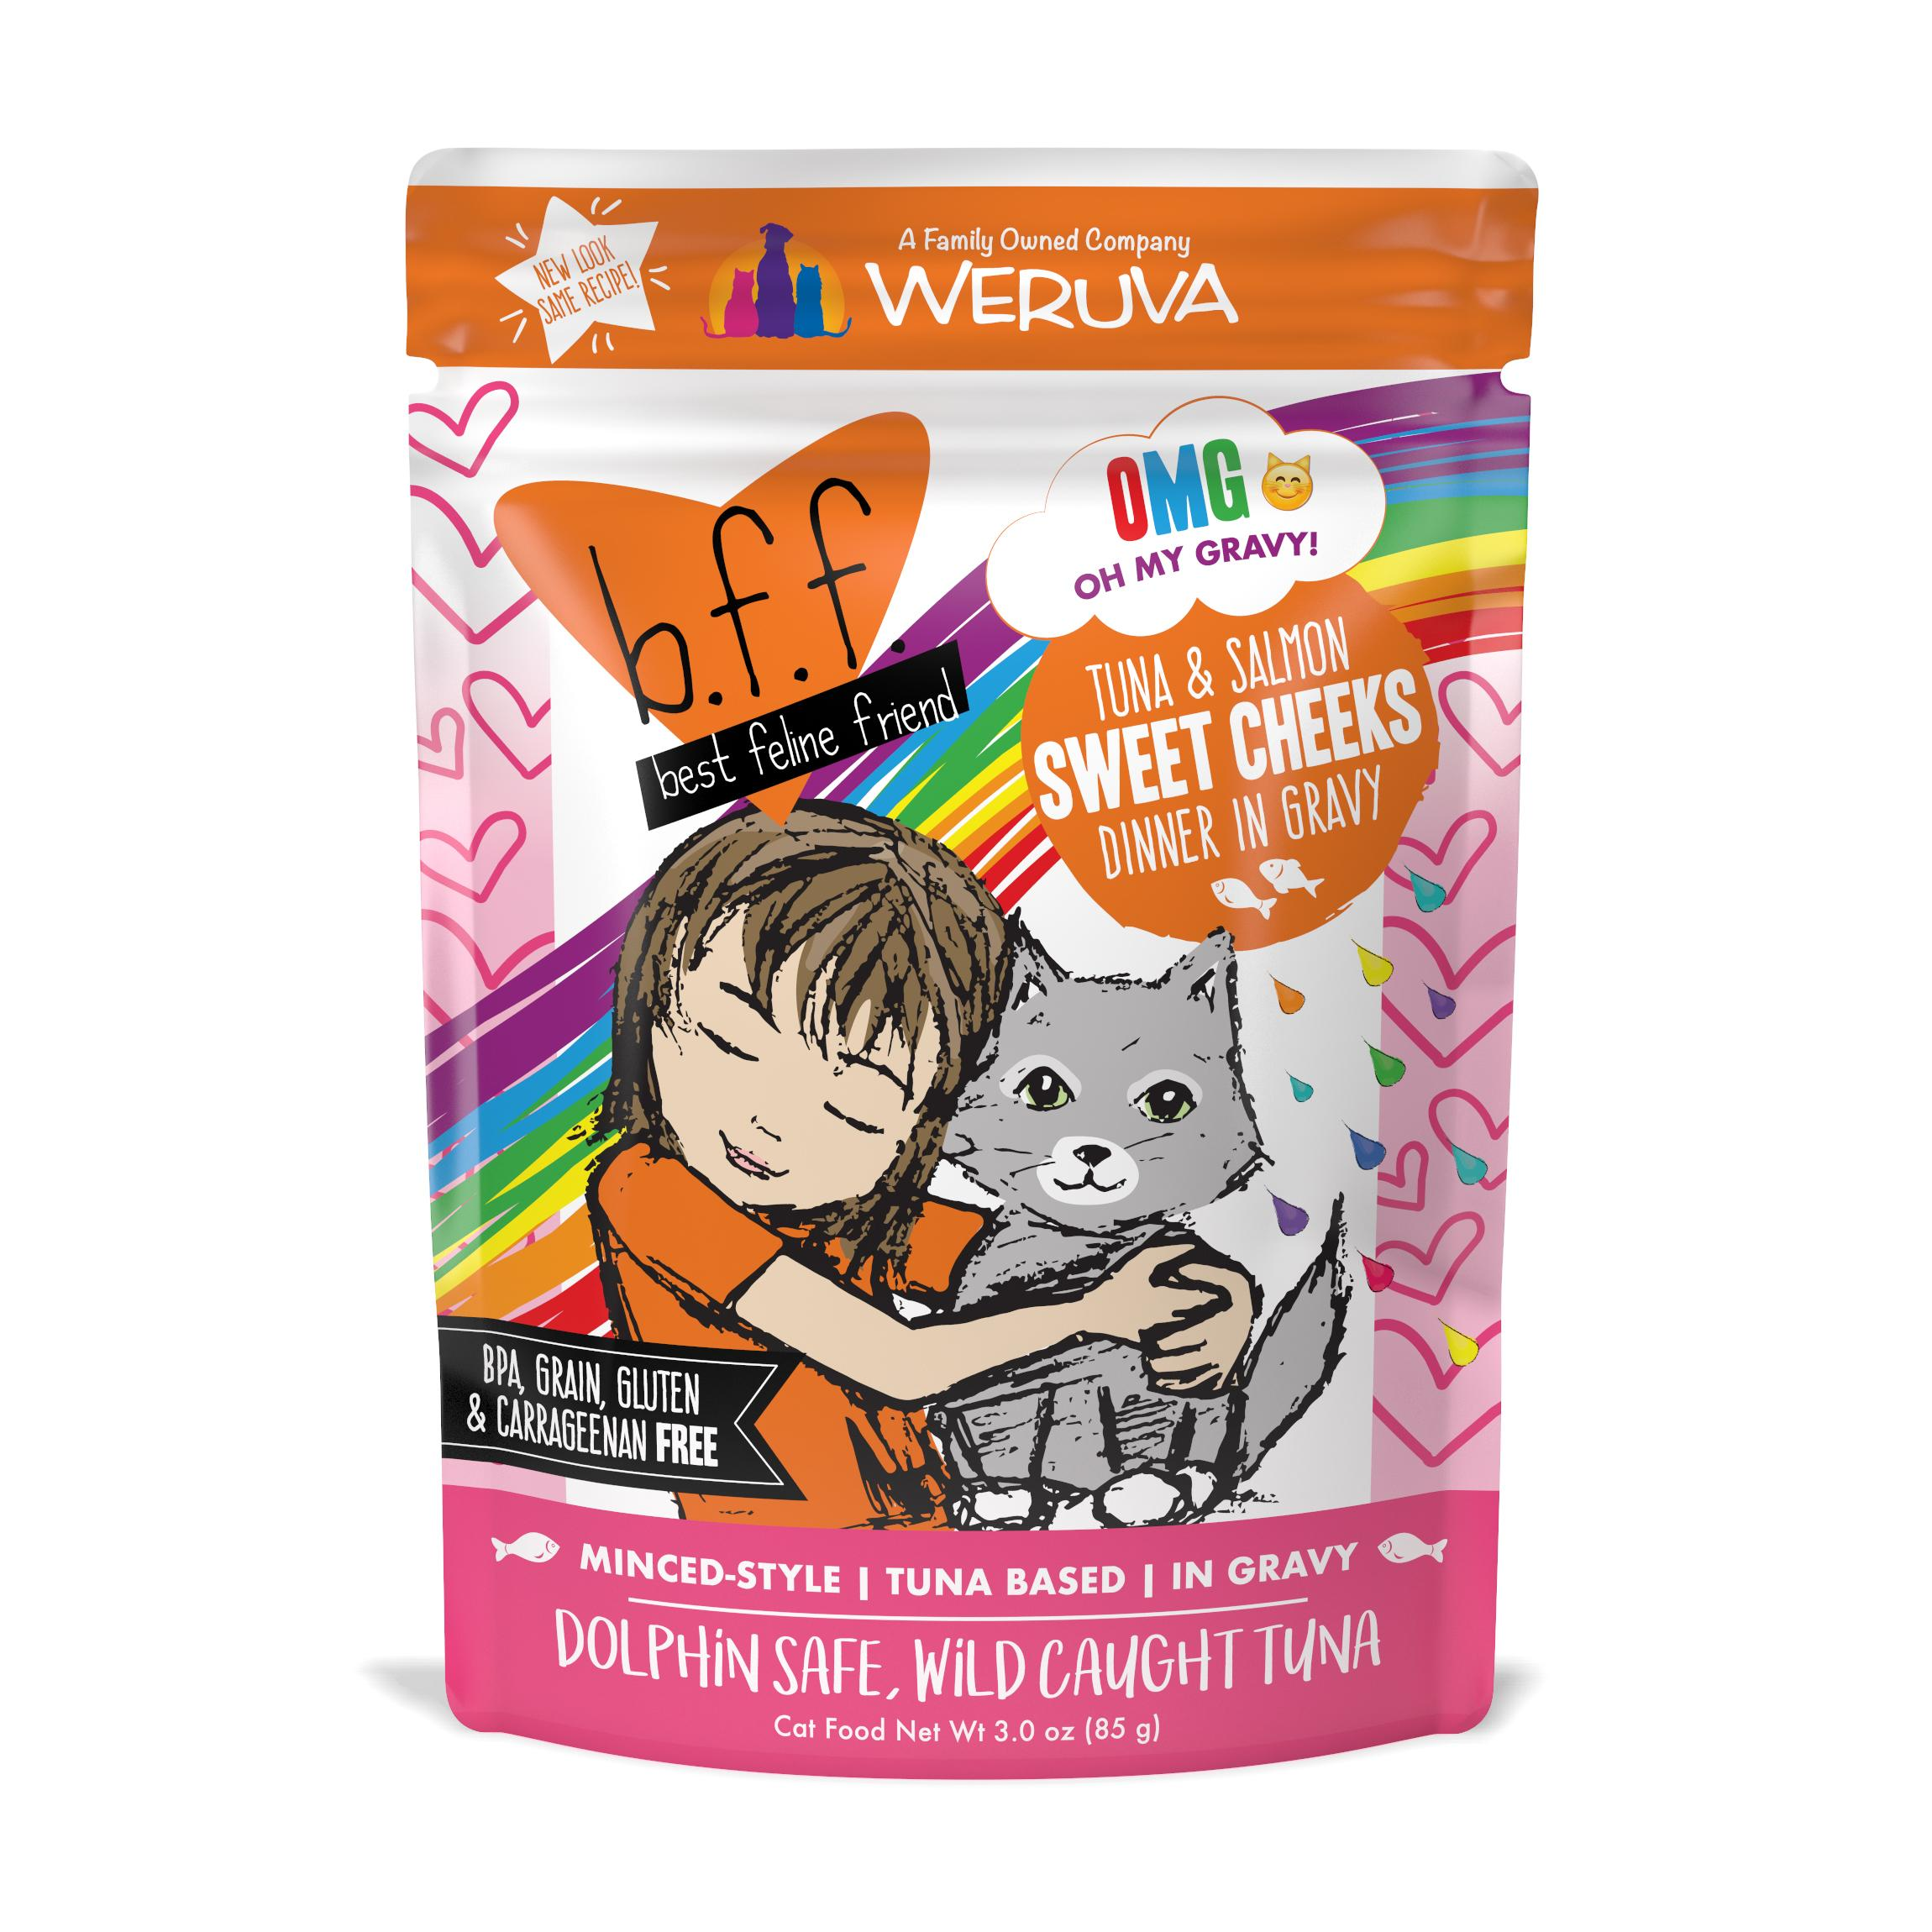 BFF Oh My Gravy! Sweet Cheeks Tuna & Salmon Dinner in Gravy Grain-Free Wet Cat Food Image